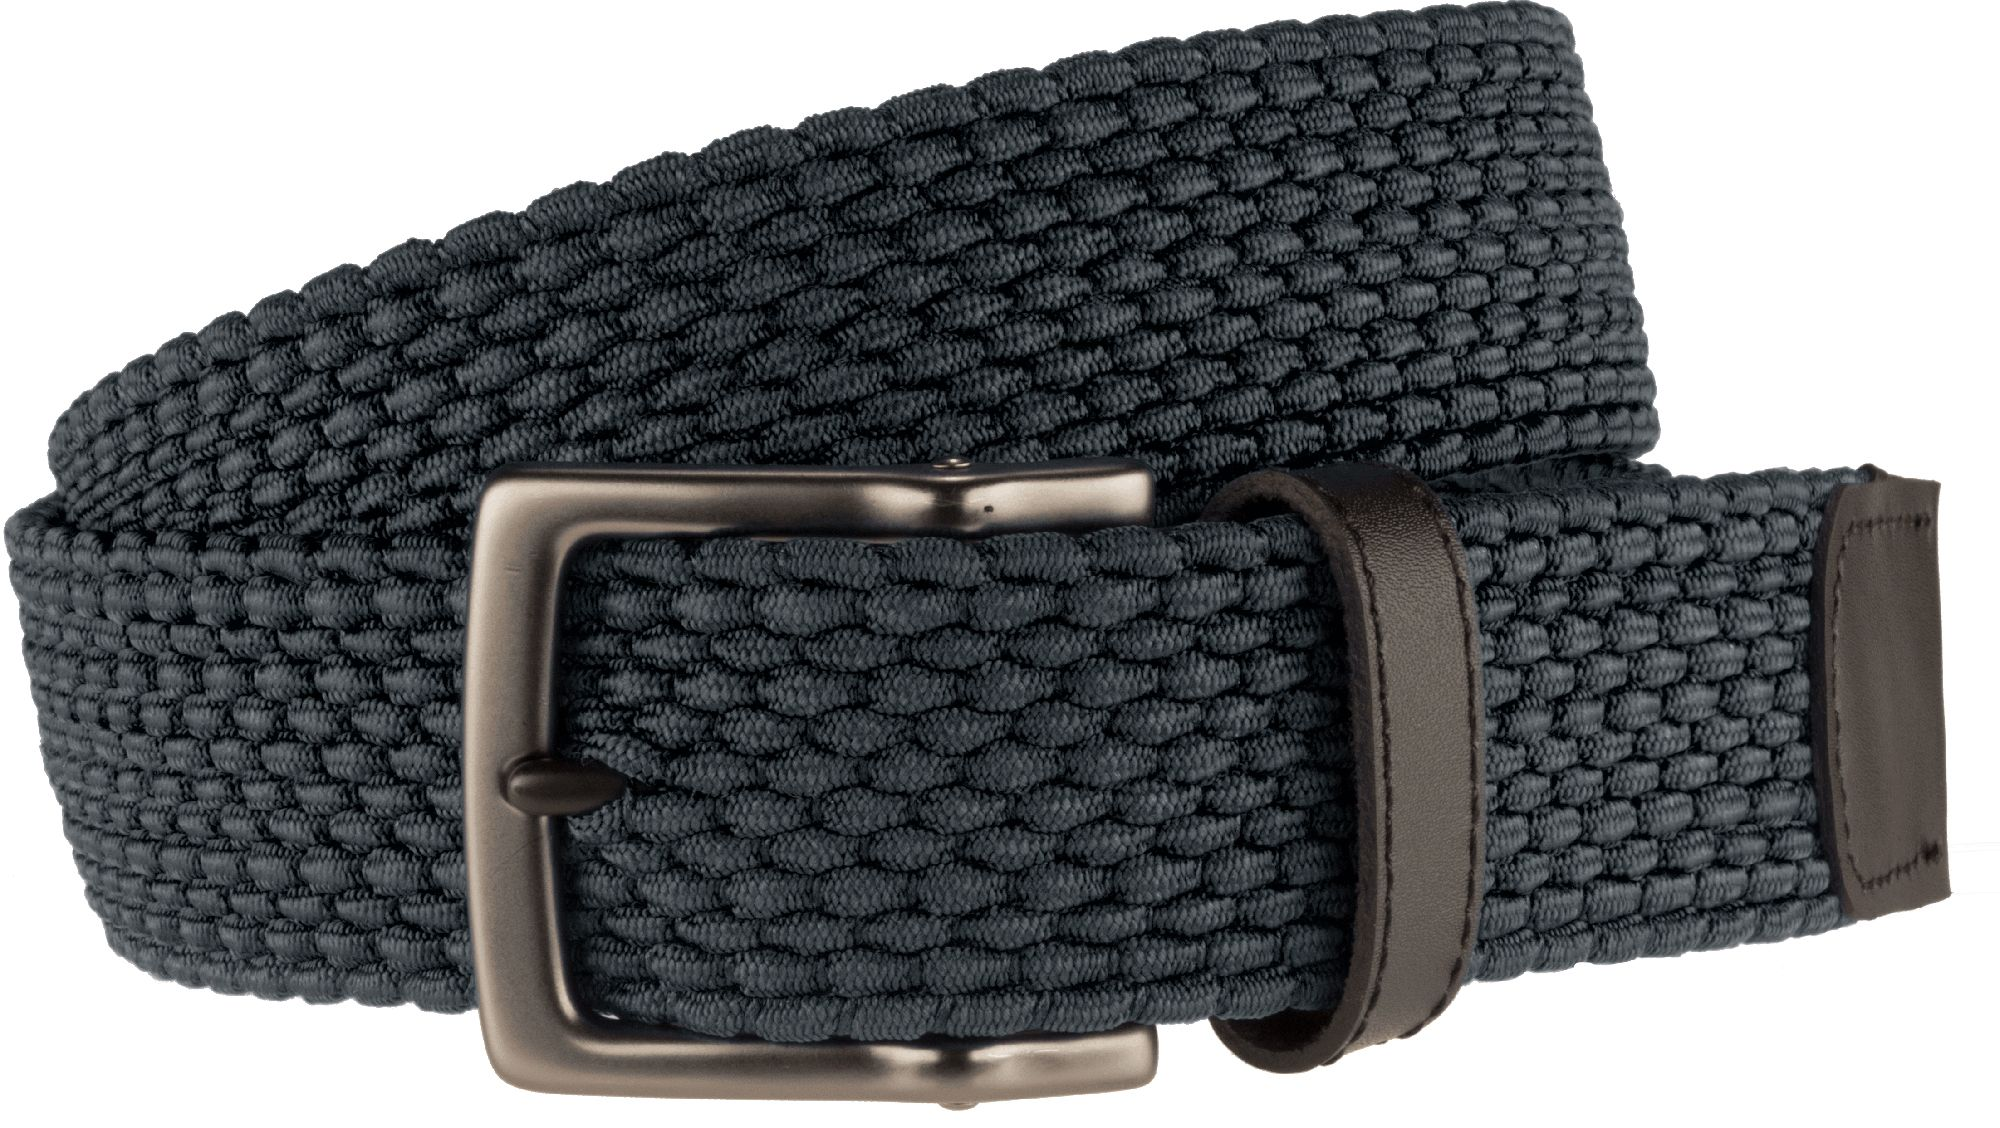 Nike Mens Stretch Woven Golf Belt DICKS Sporting Goods